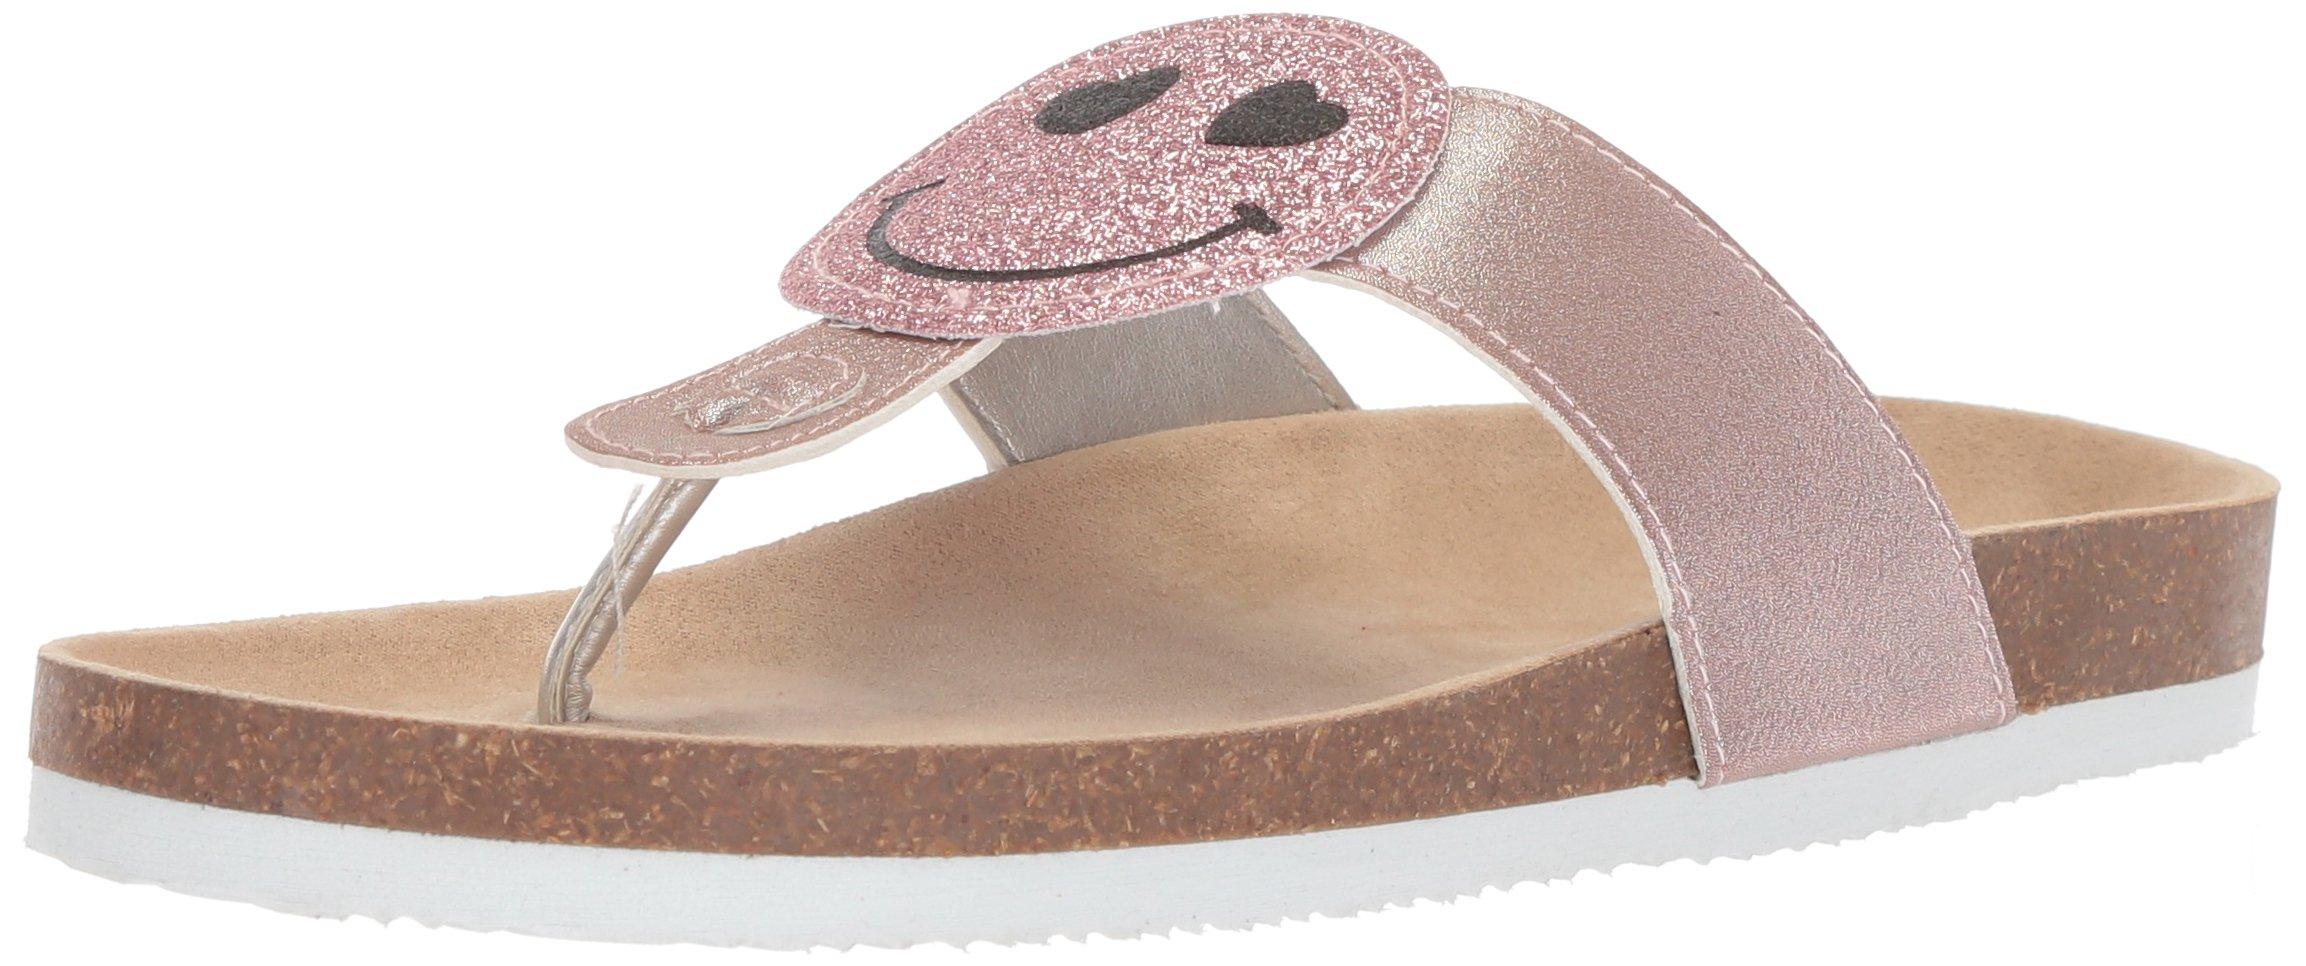 The Children's Place Girls' BG Smile Luna Flat Sandal, Pink, Youth 1 Medium US Big Kid